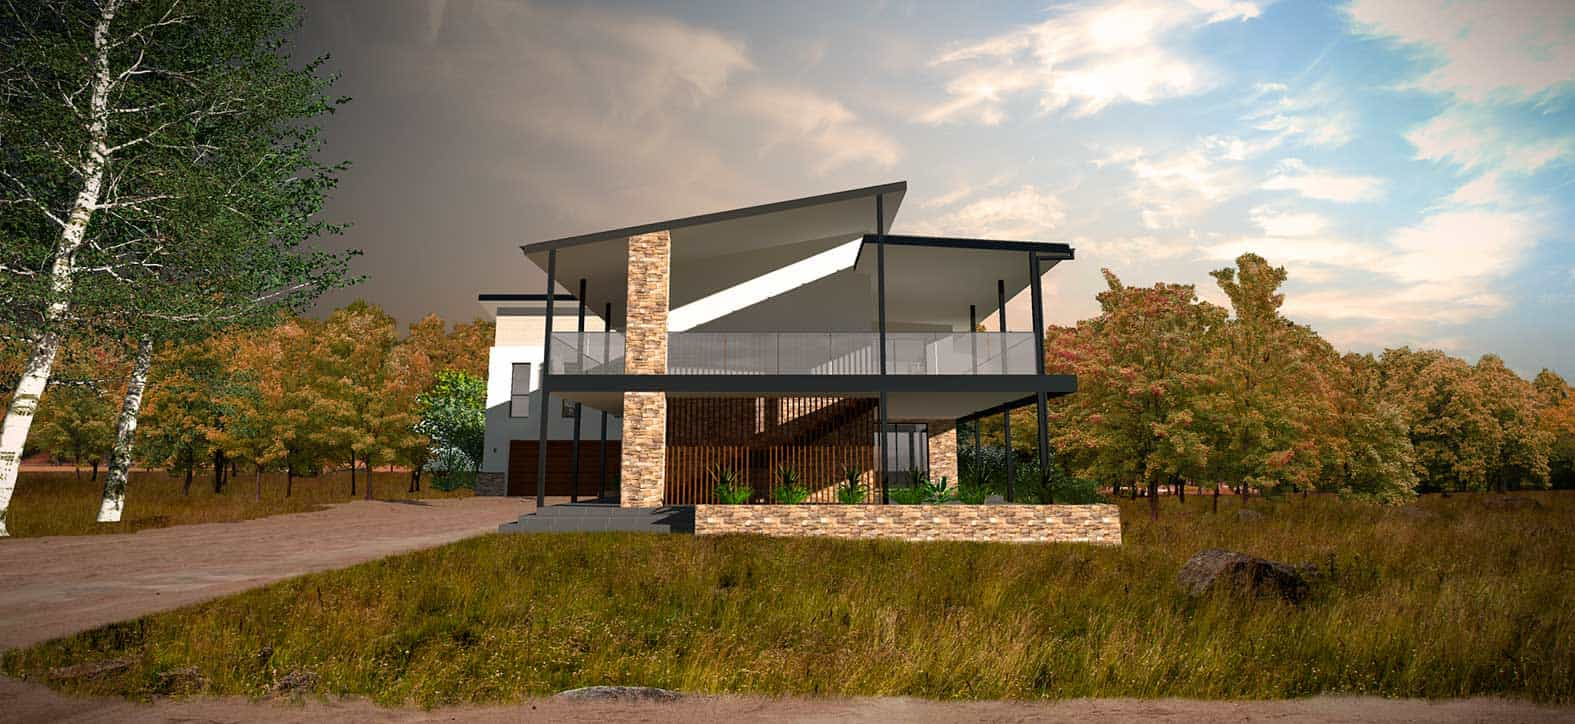 Maison architecte Pitt Town Australie